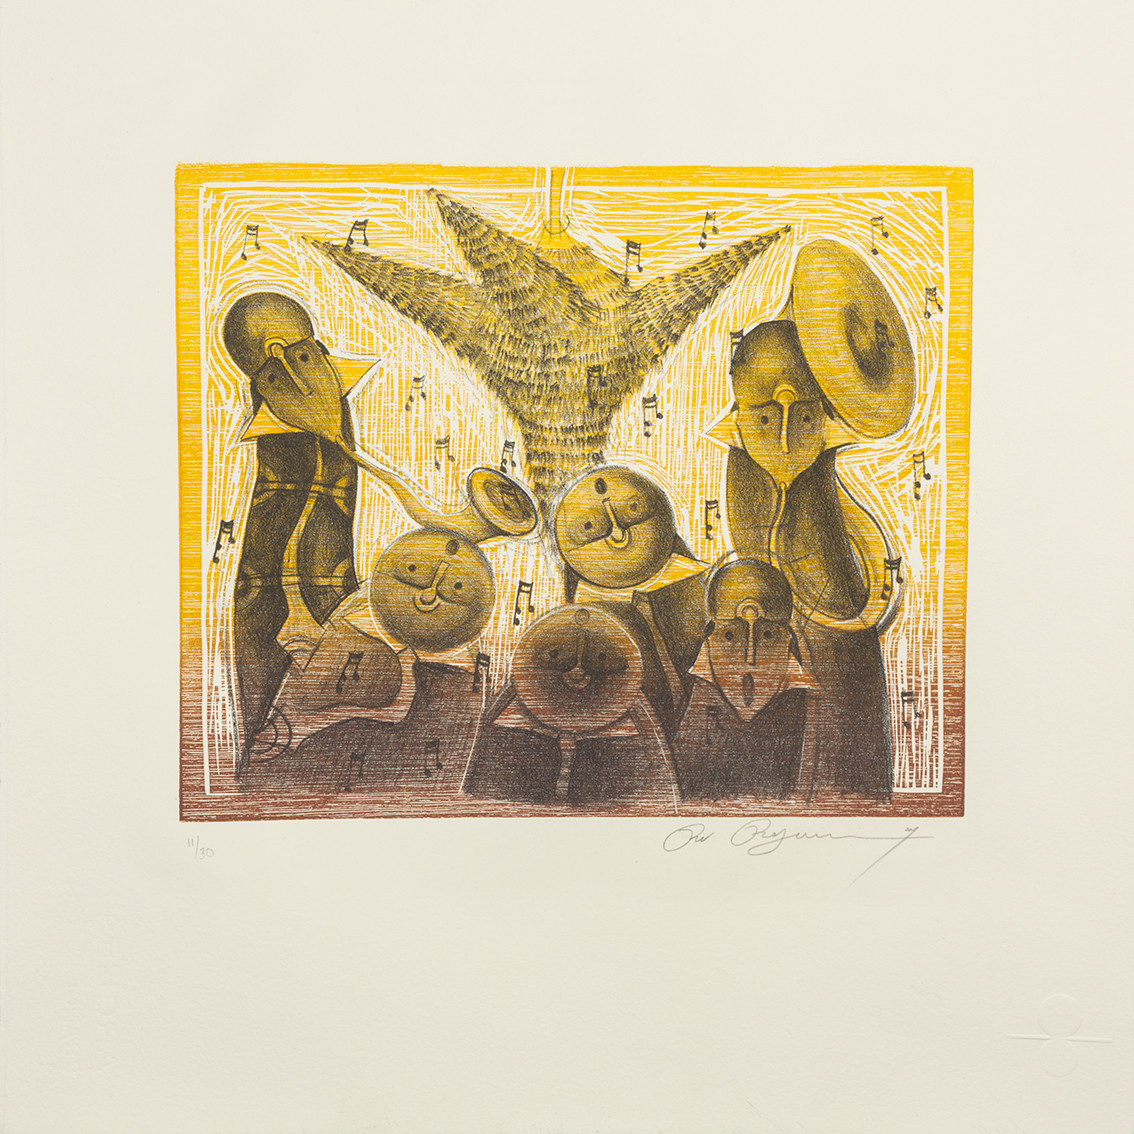 Rolando Rojas, Posaderos, Lithograph (ed. 11/30), 15.7 x 17.7 in.